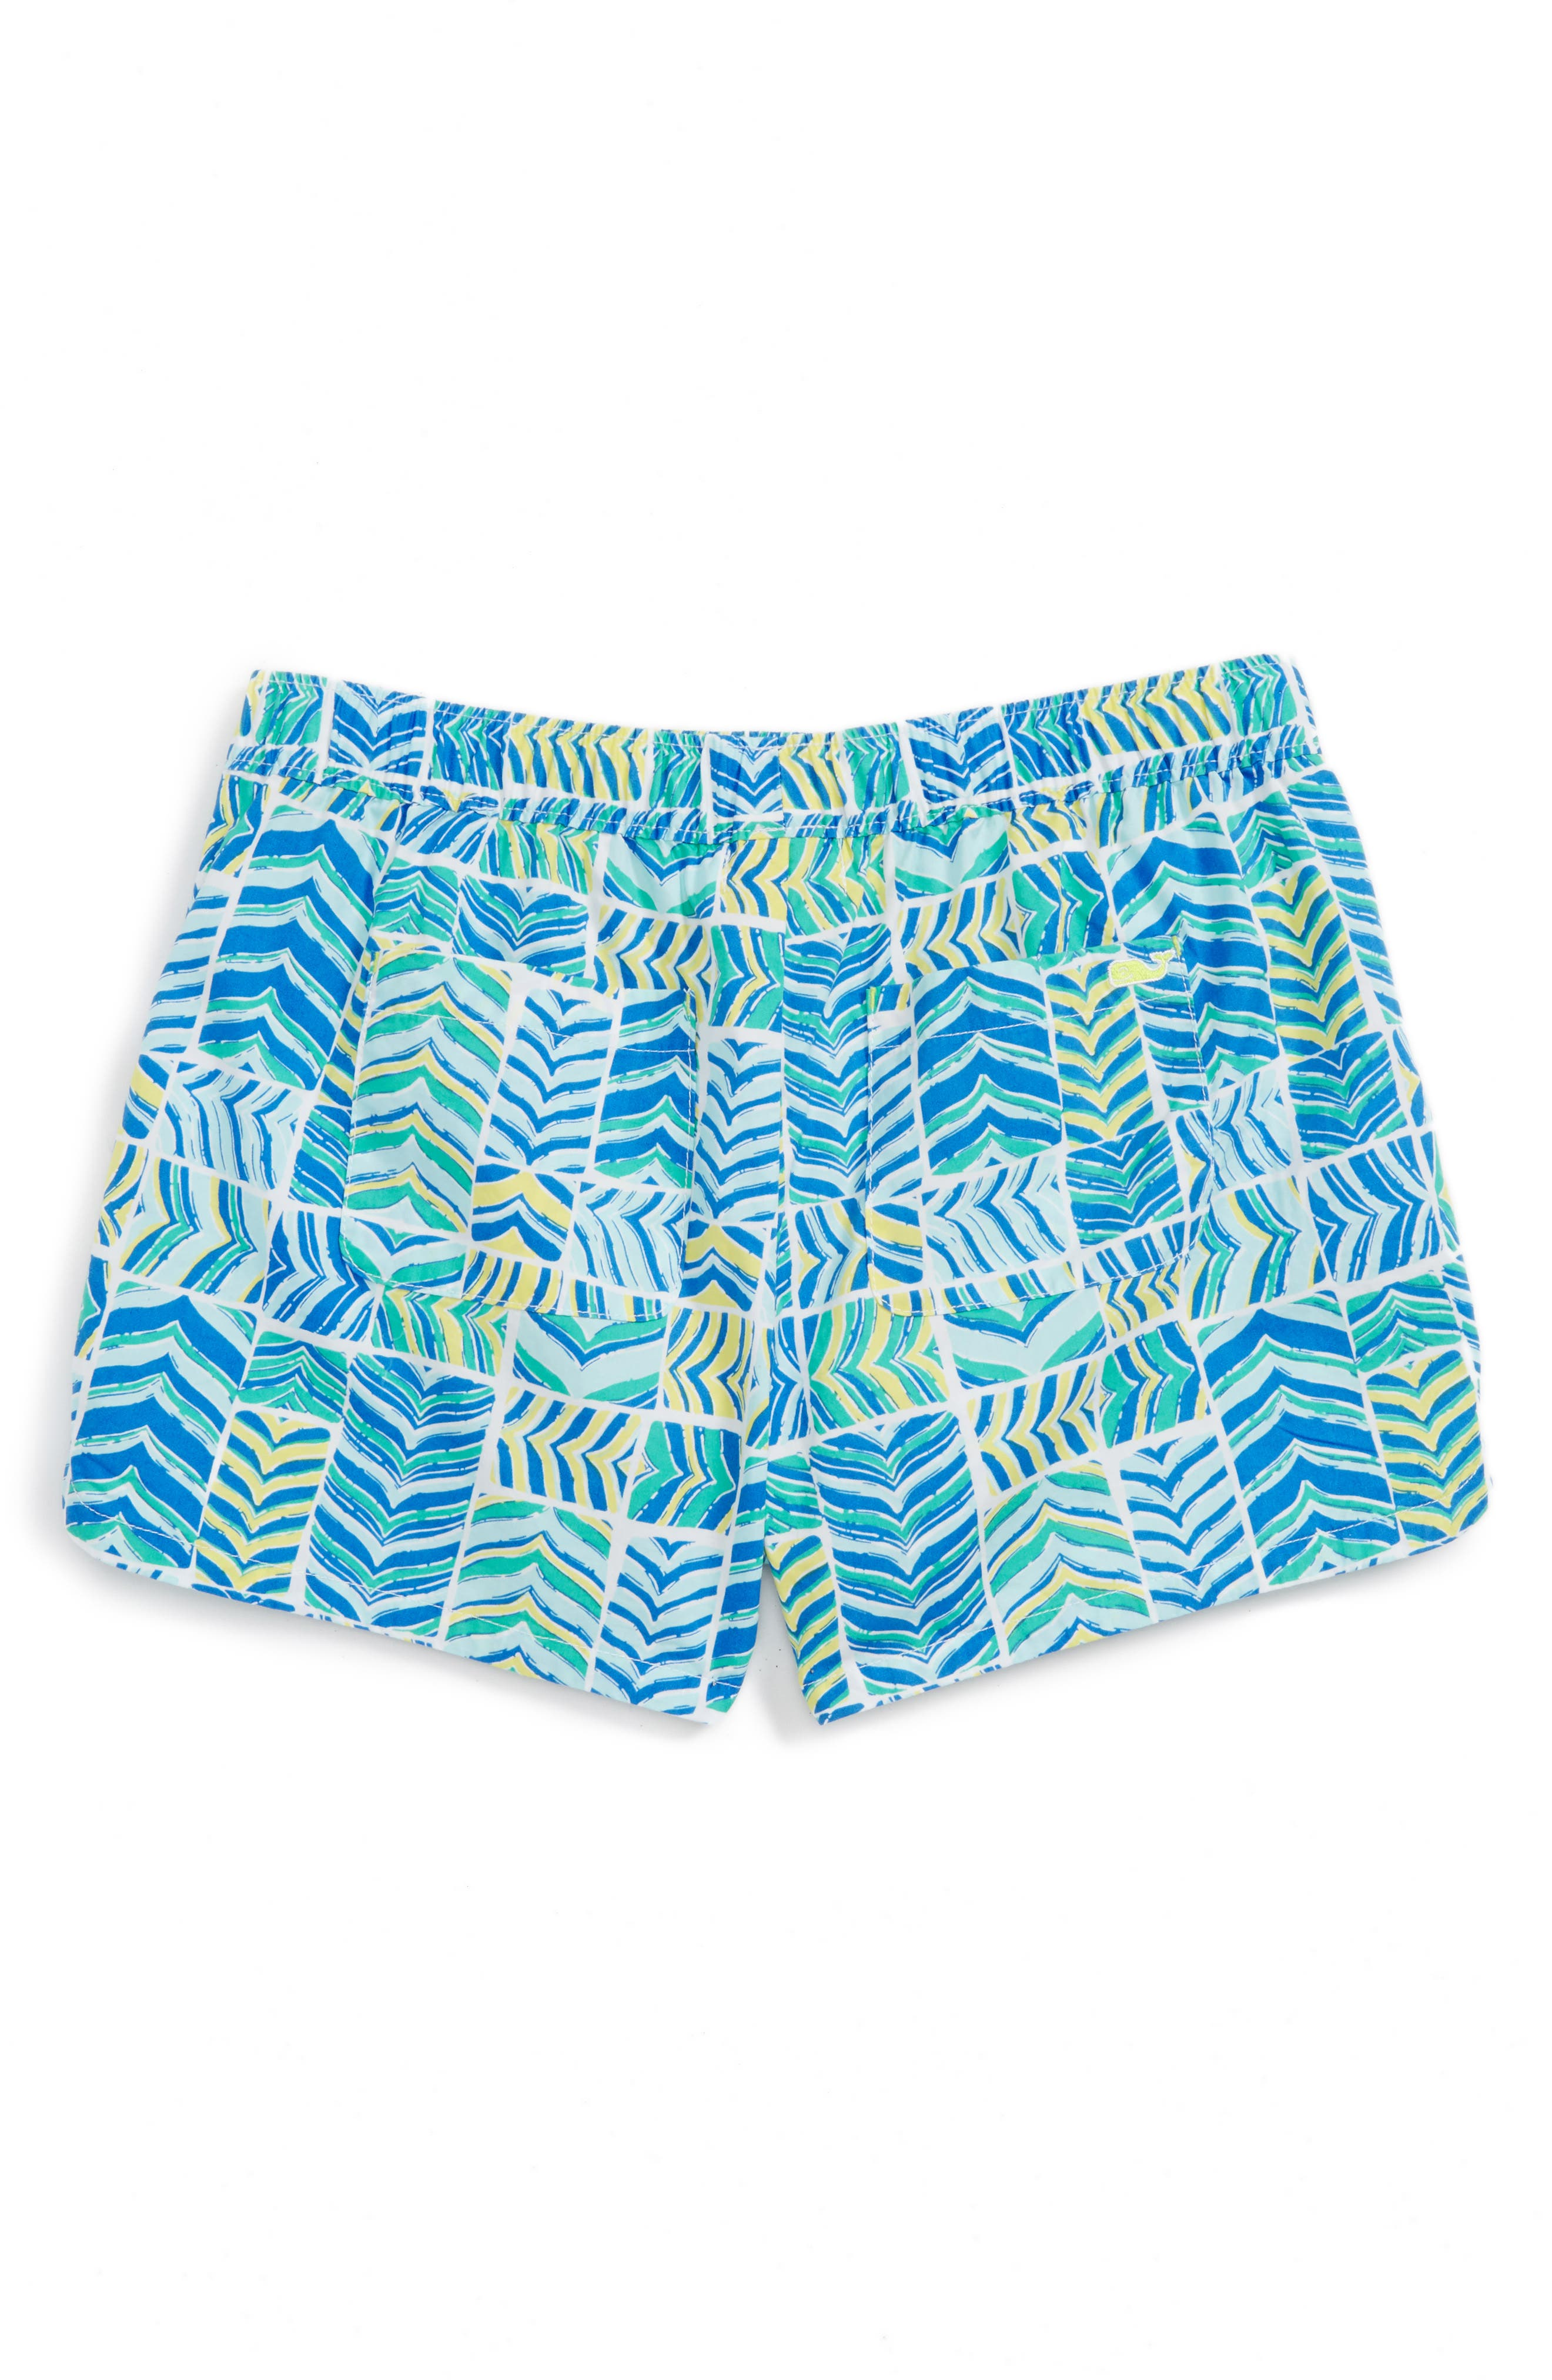 Whaletail Patchwork Shorts,                             Alternate thumbnail 2, color,                             Azure Blue